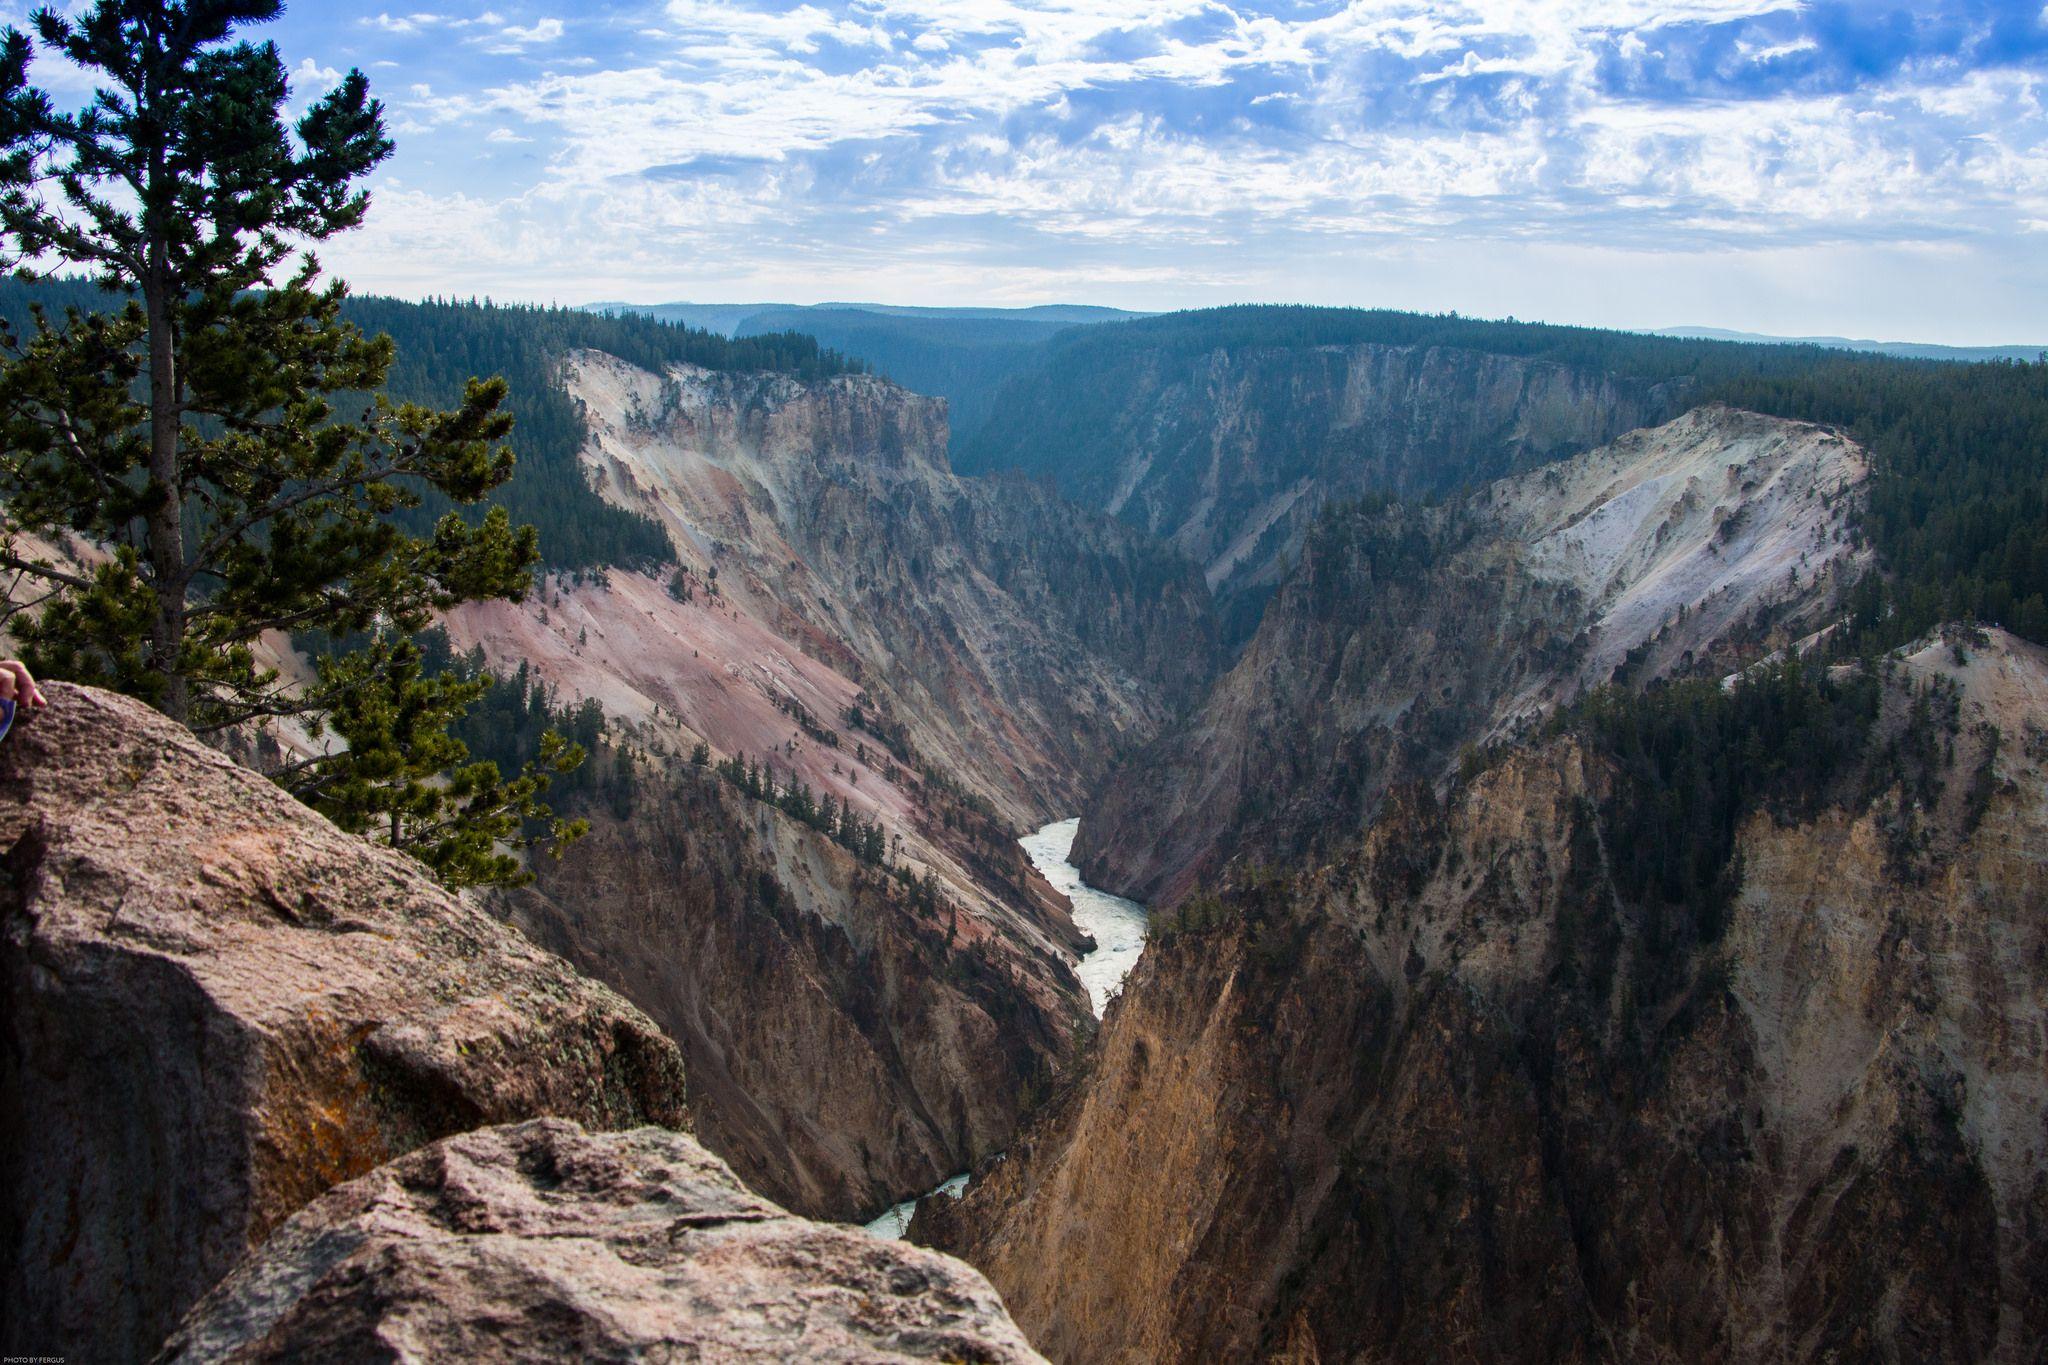 Yellowstone National Park Rv Parks >> Rv Destination Guide Yellowstone National Park